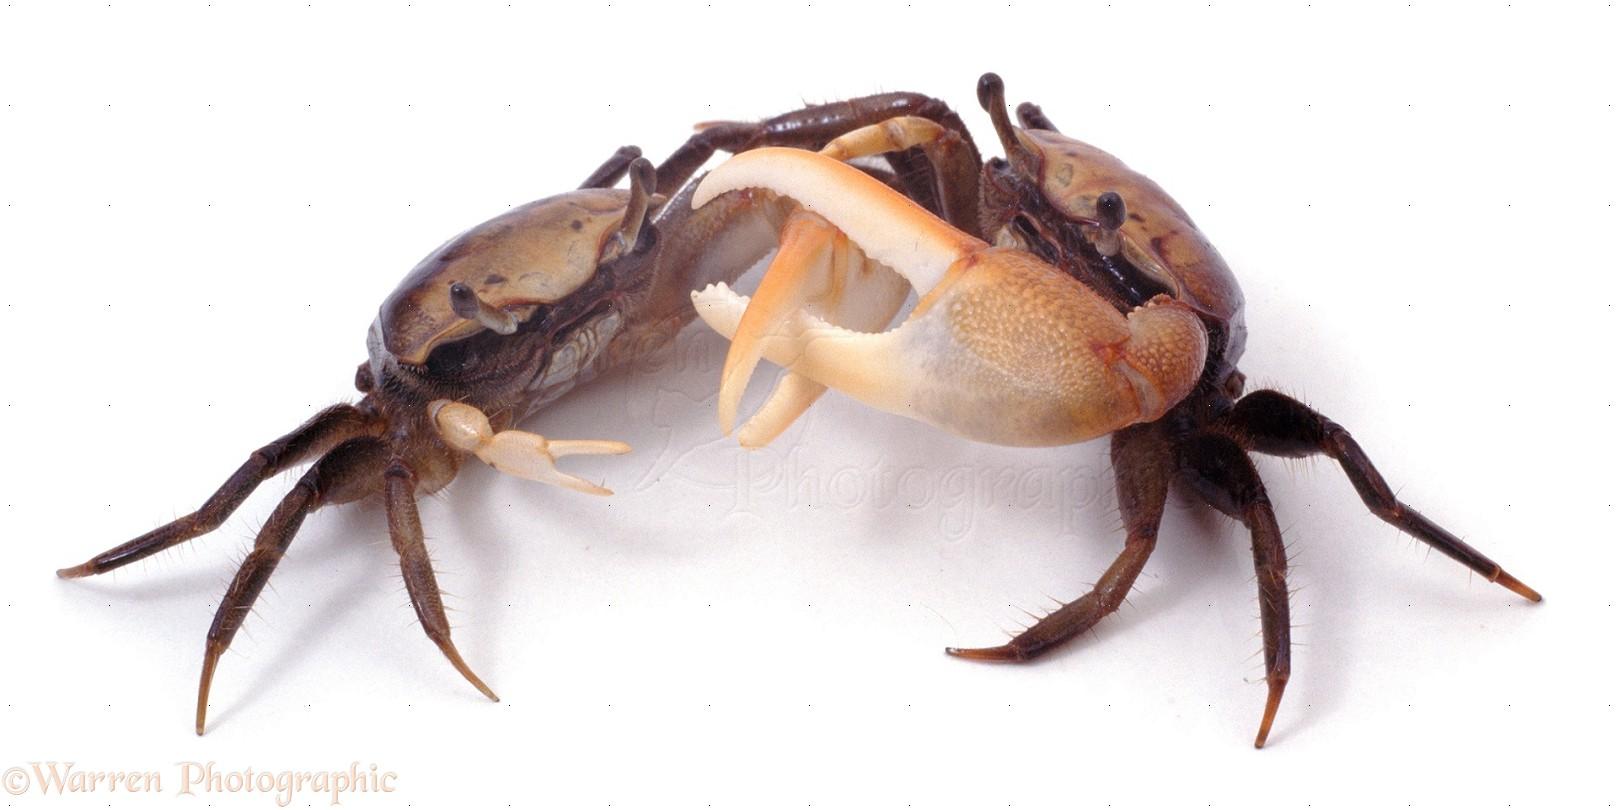 Crabs Fighting Images & Pictures - Findpik